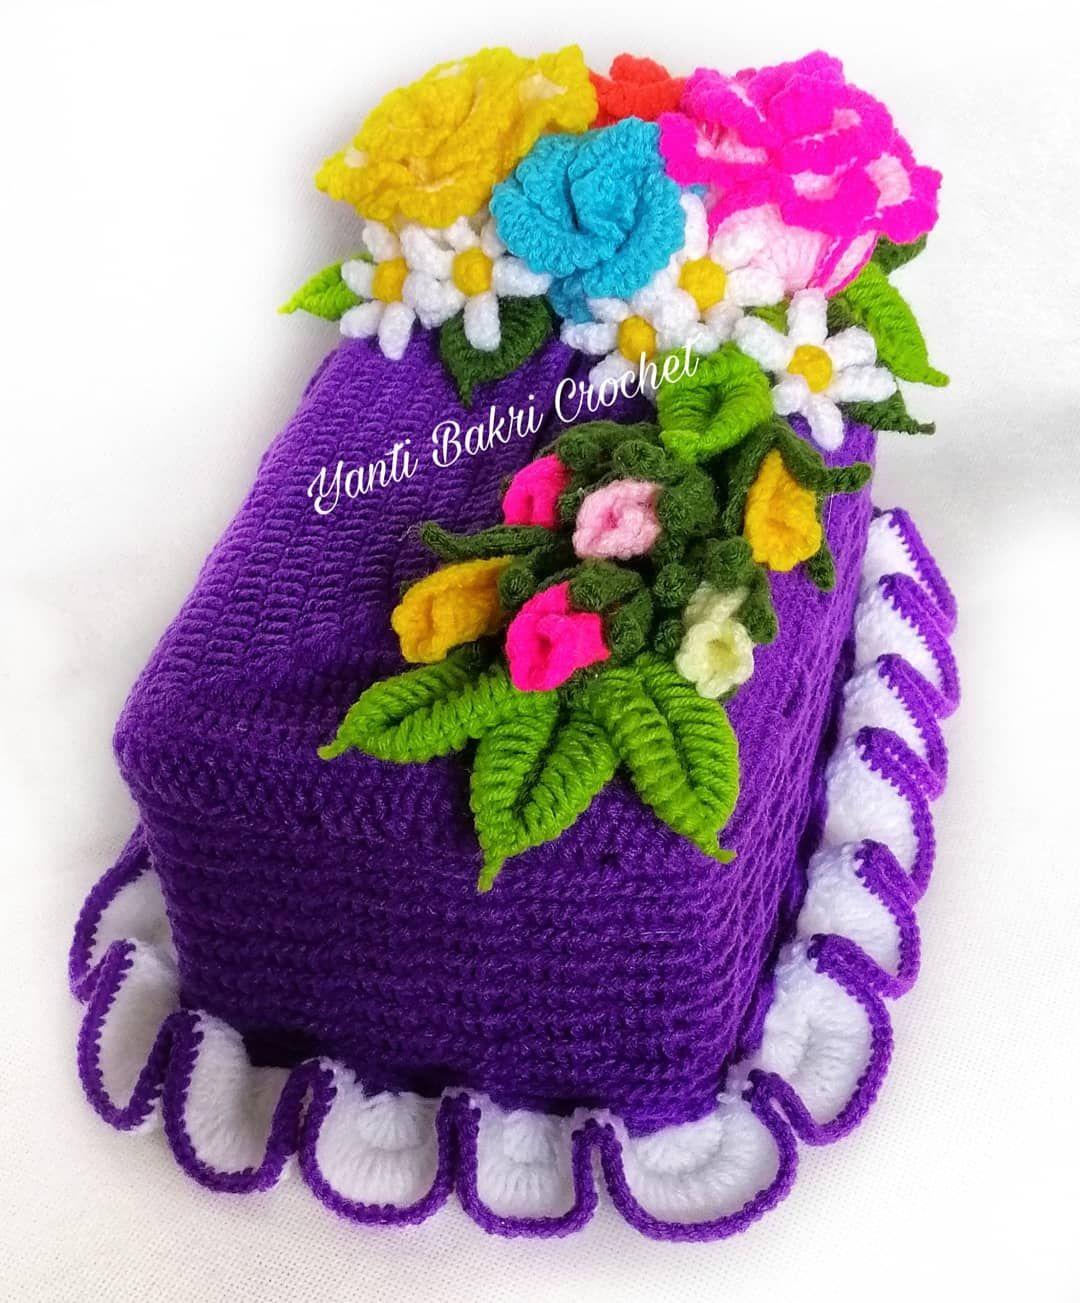 Kotak Tissu : kotak, tissu, KRISTEN, MORGAN, Individuales, Crochet, Handmade, Crochet,, Acrylic, Yarn,